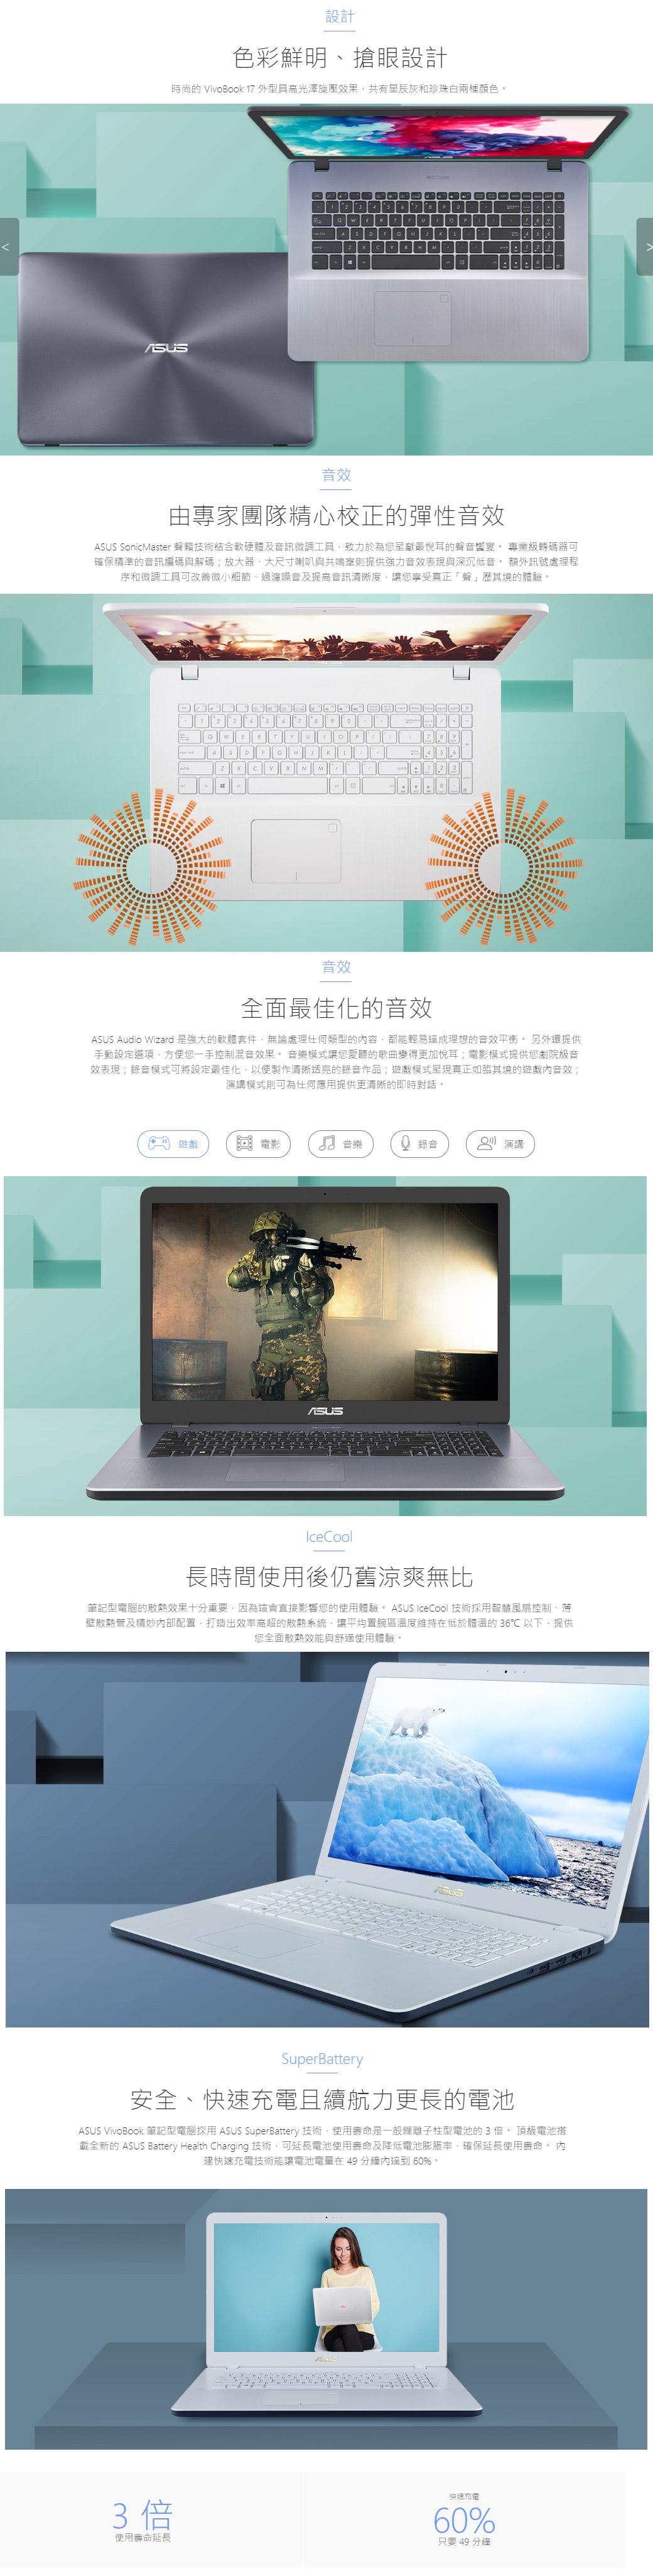 X705MB_2.jpg